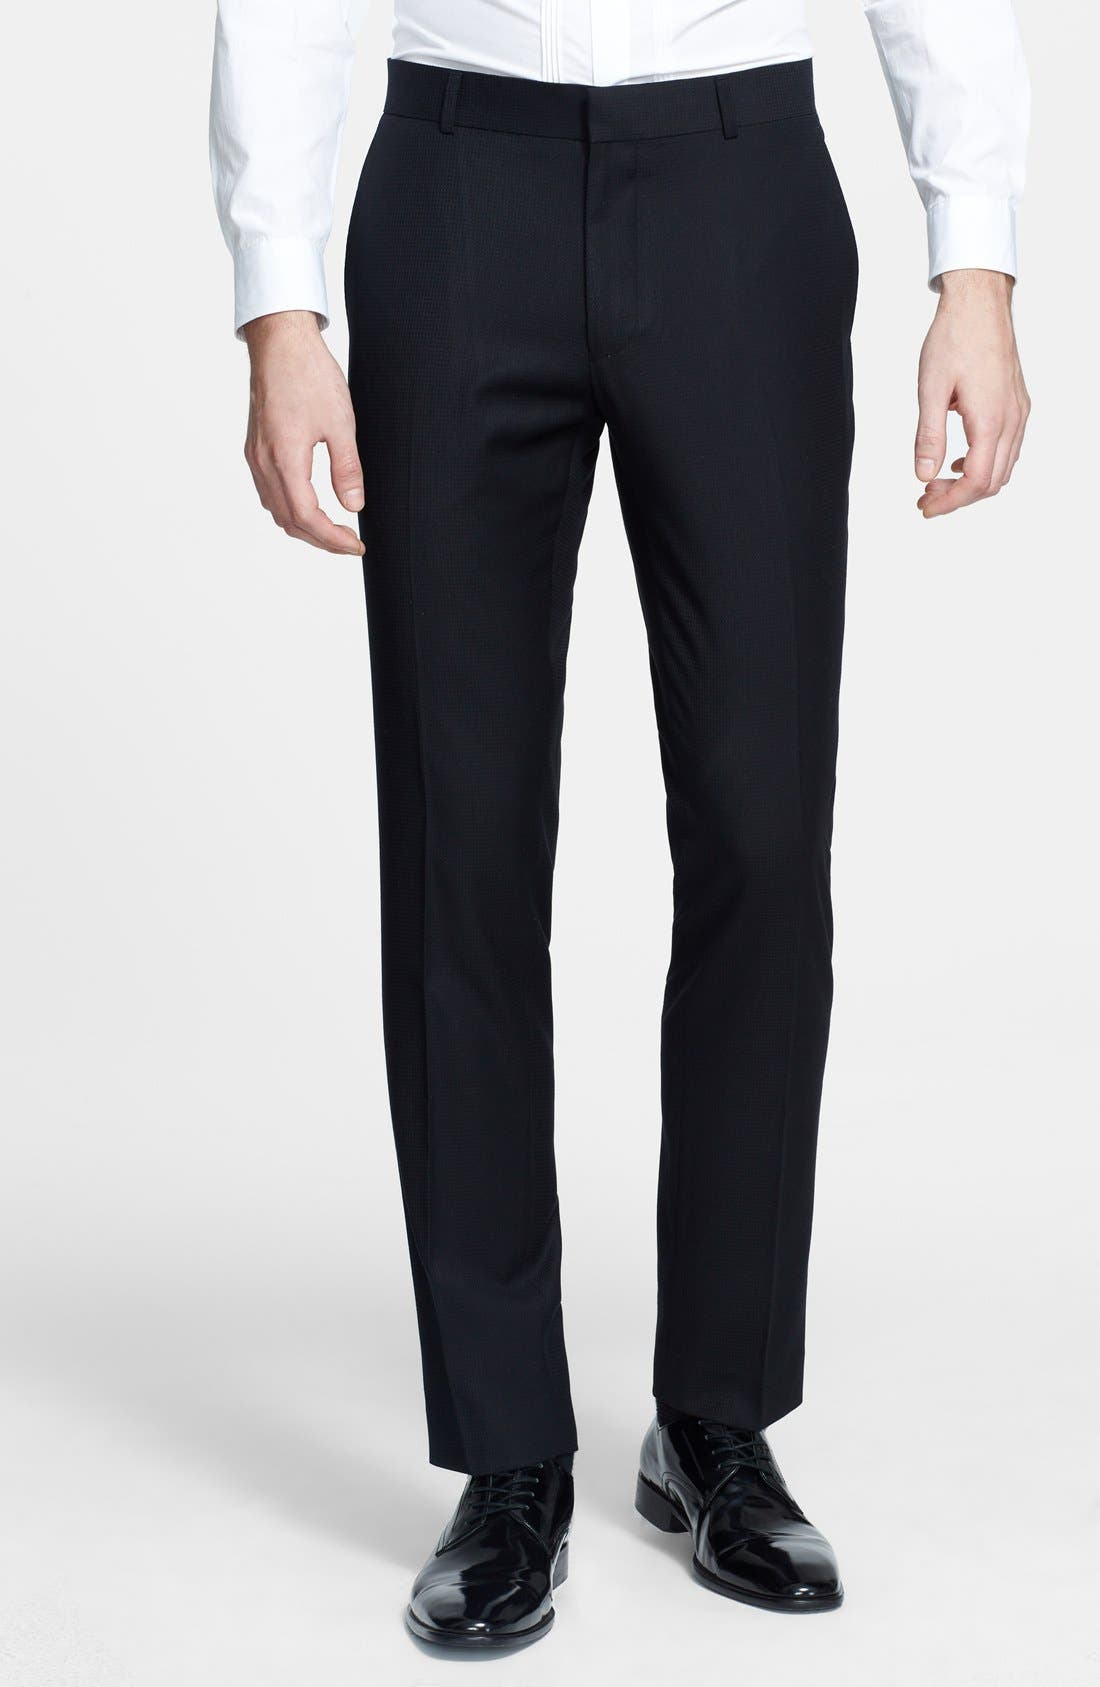 Alternate Image 1 Selected - Topman Skinny Fit Jacquard Tuxedo Trousers